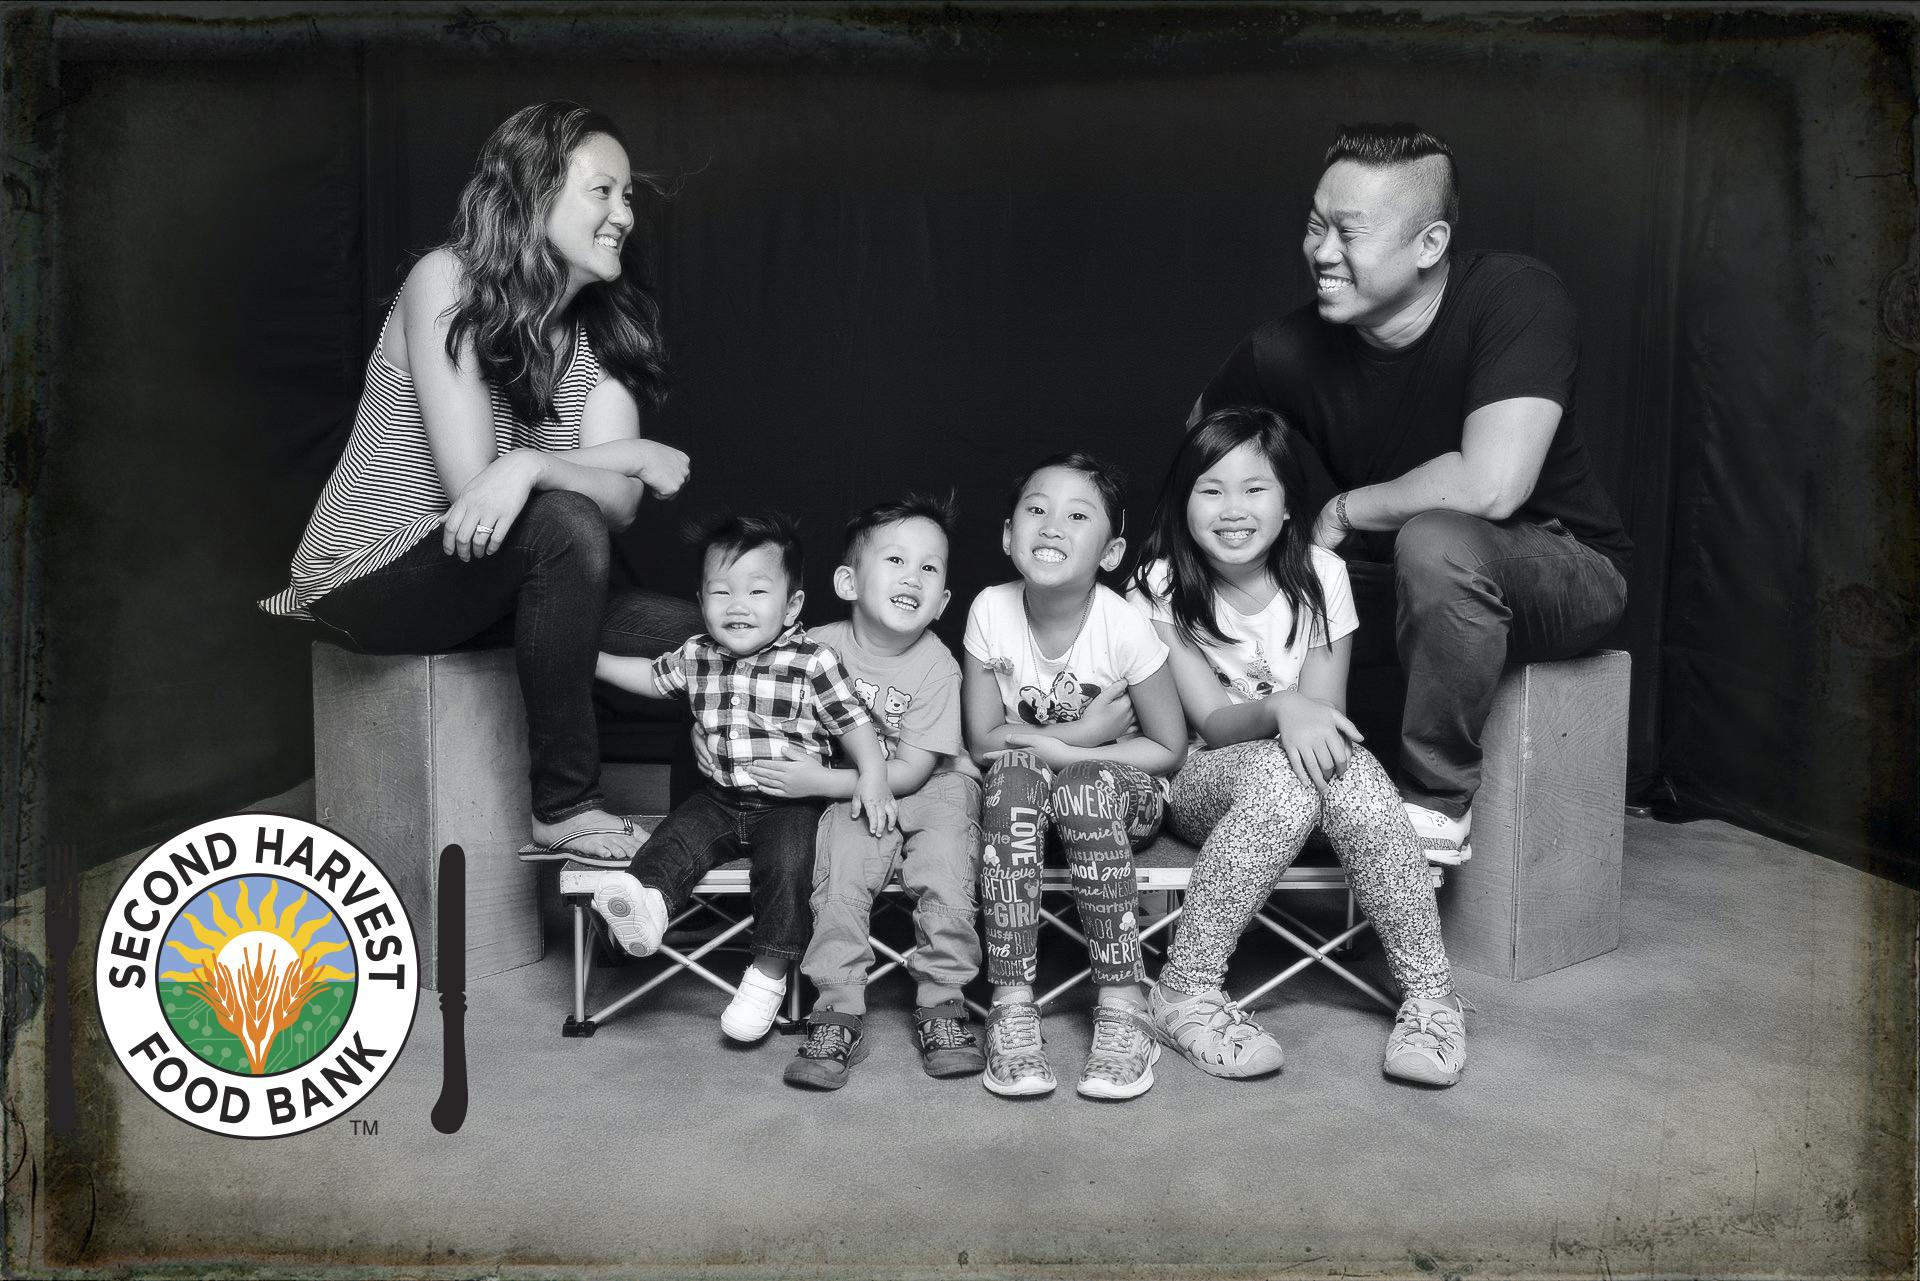 Black and White Family Portrait on Black Background